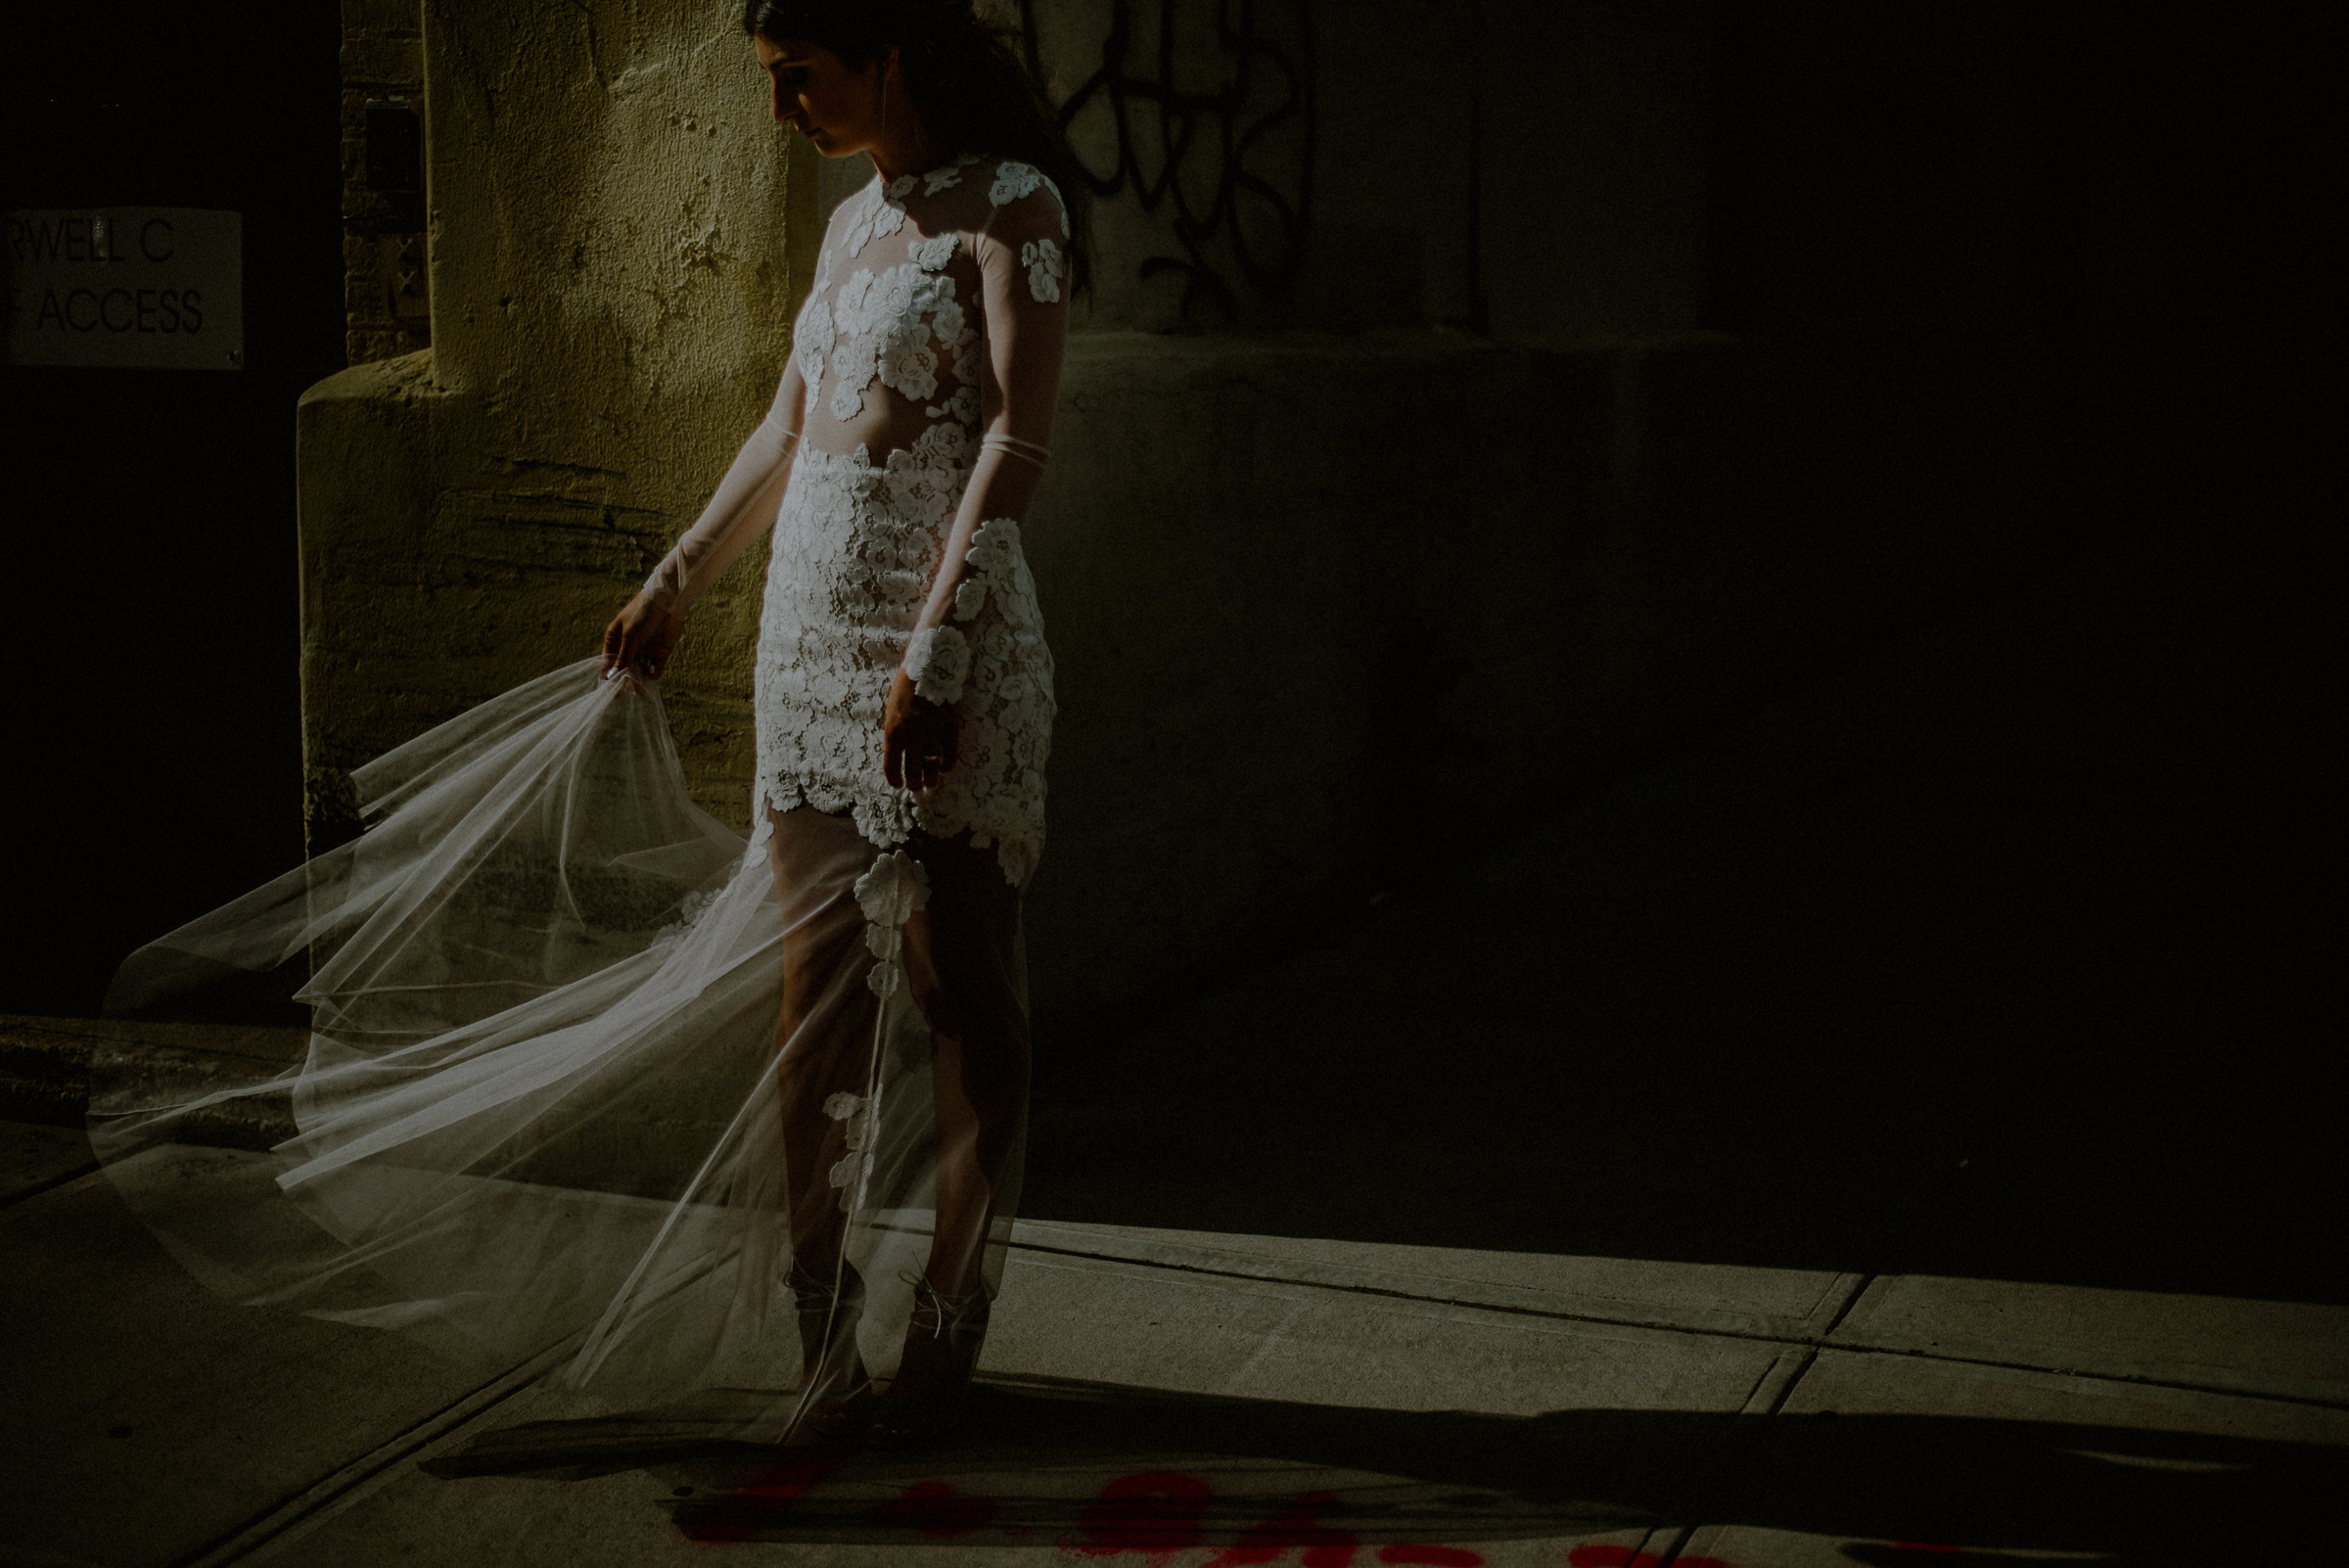 bride-with-veil-in-shadow-carolina-rivera-photography